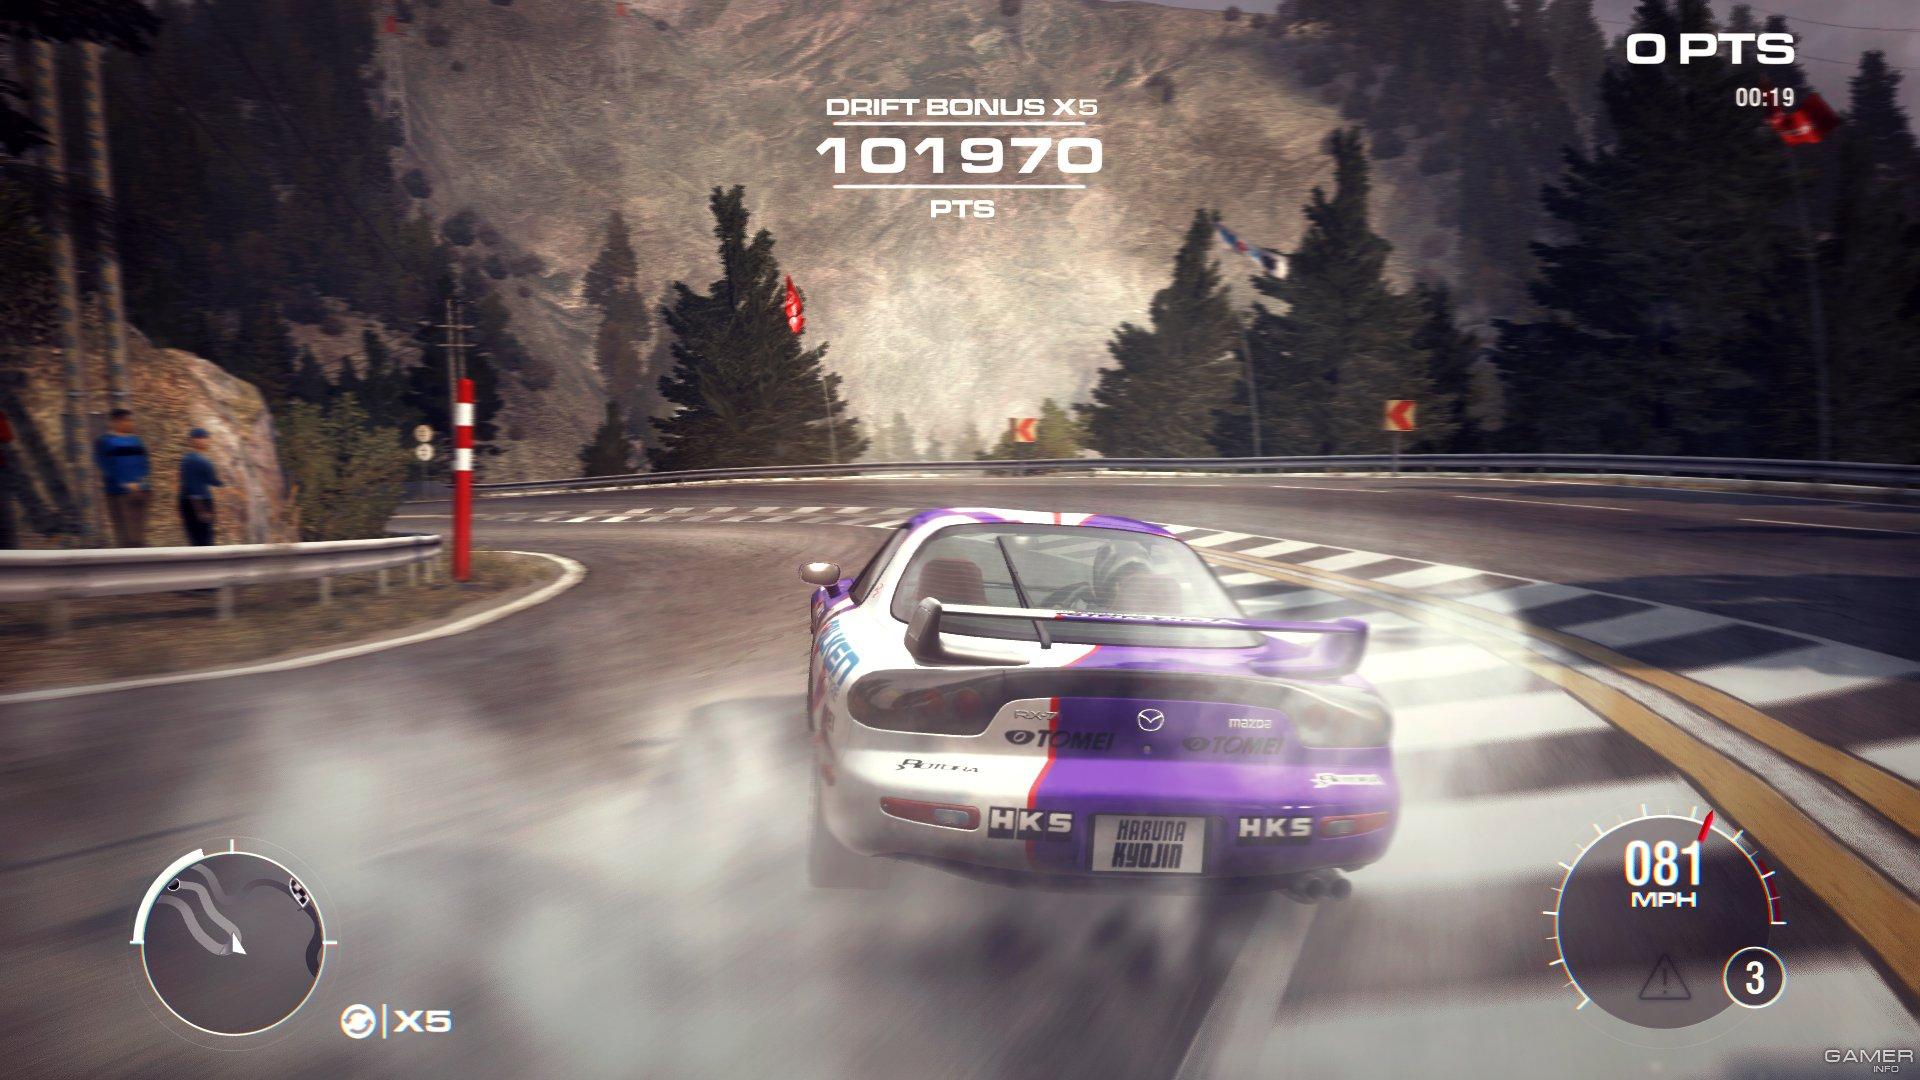 GRID 2 (2013 video game)